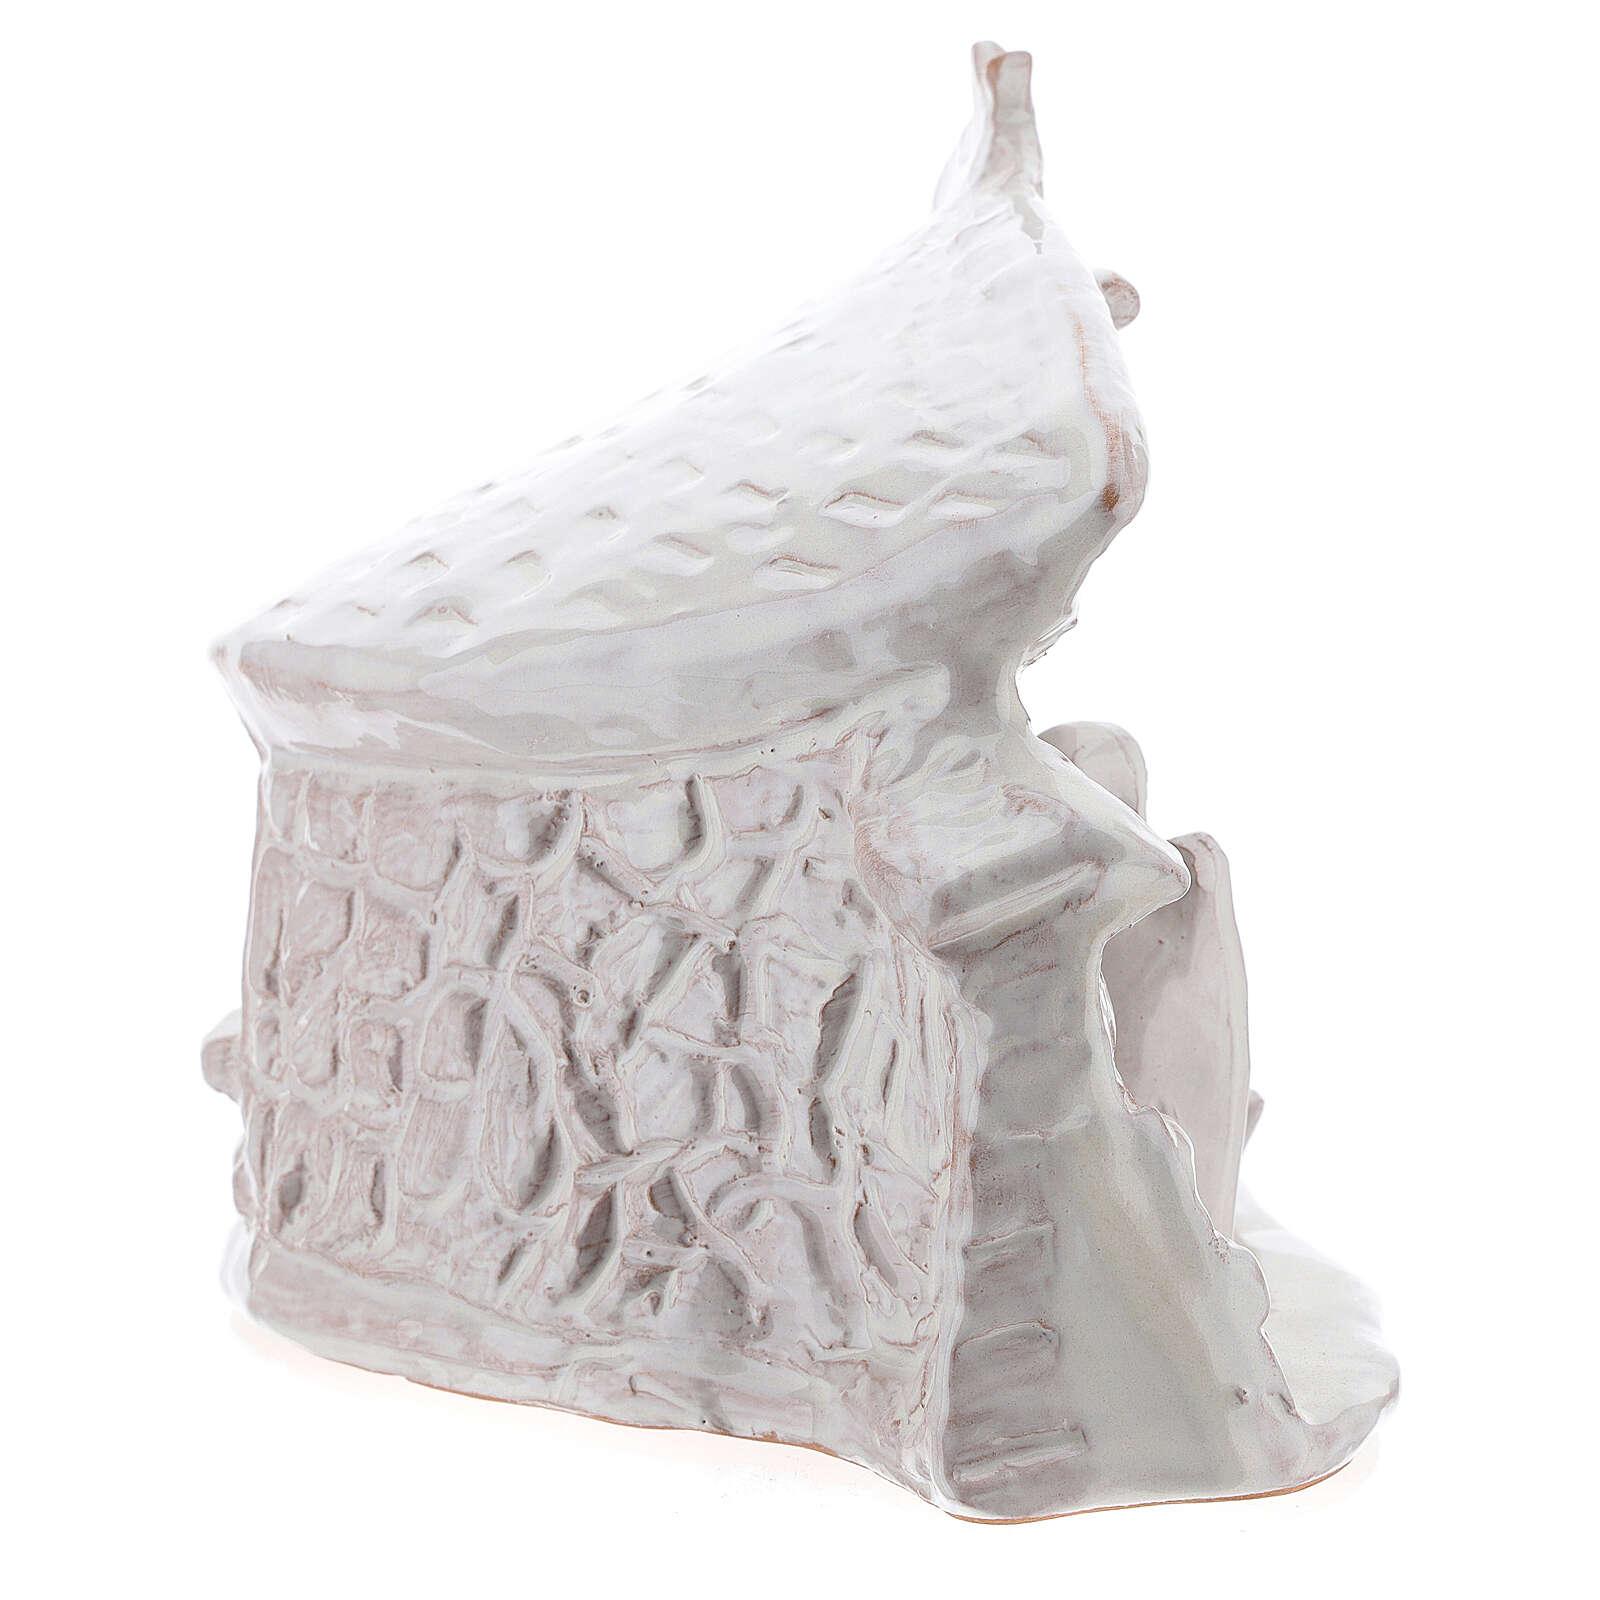 Cabaña Sagrada Familia vigas paredes de piedra terracota blanca Deruta 20 cm 4